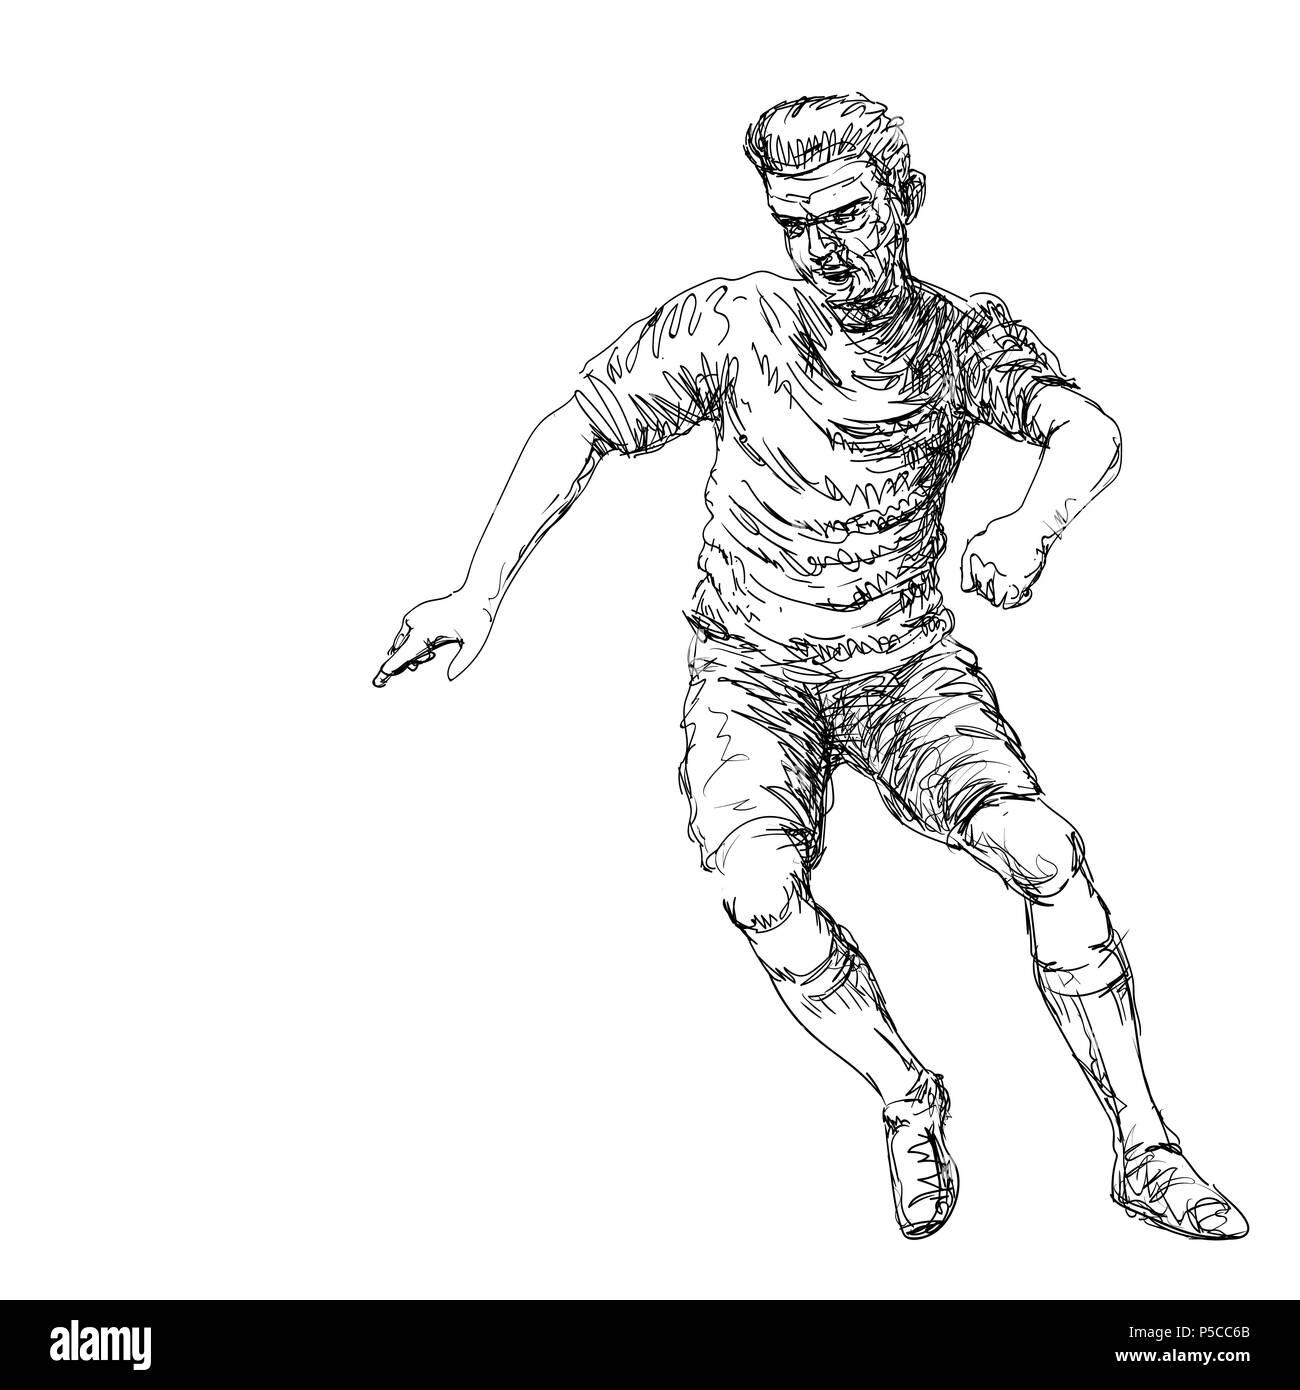 Hand drawing of Soccer Player kicking a ball - Vector Hand drawn Illustration. - Stock Vector